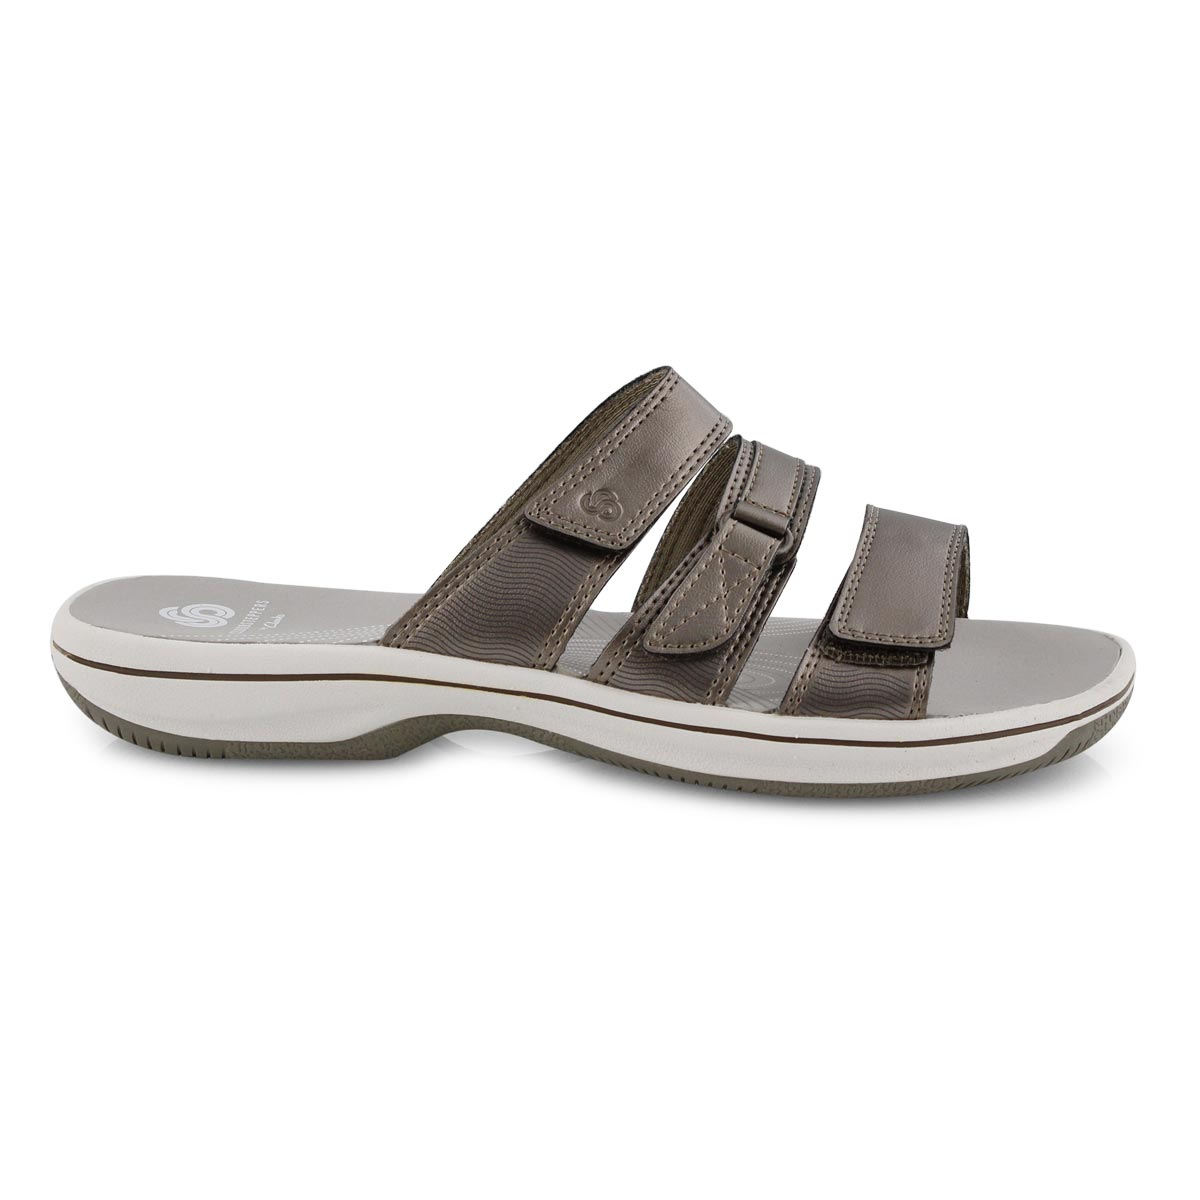 Lds Brinkley Coast pewter slide sandal